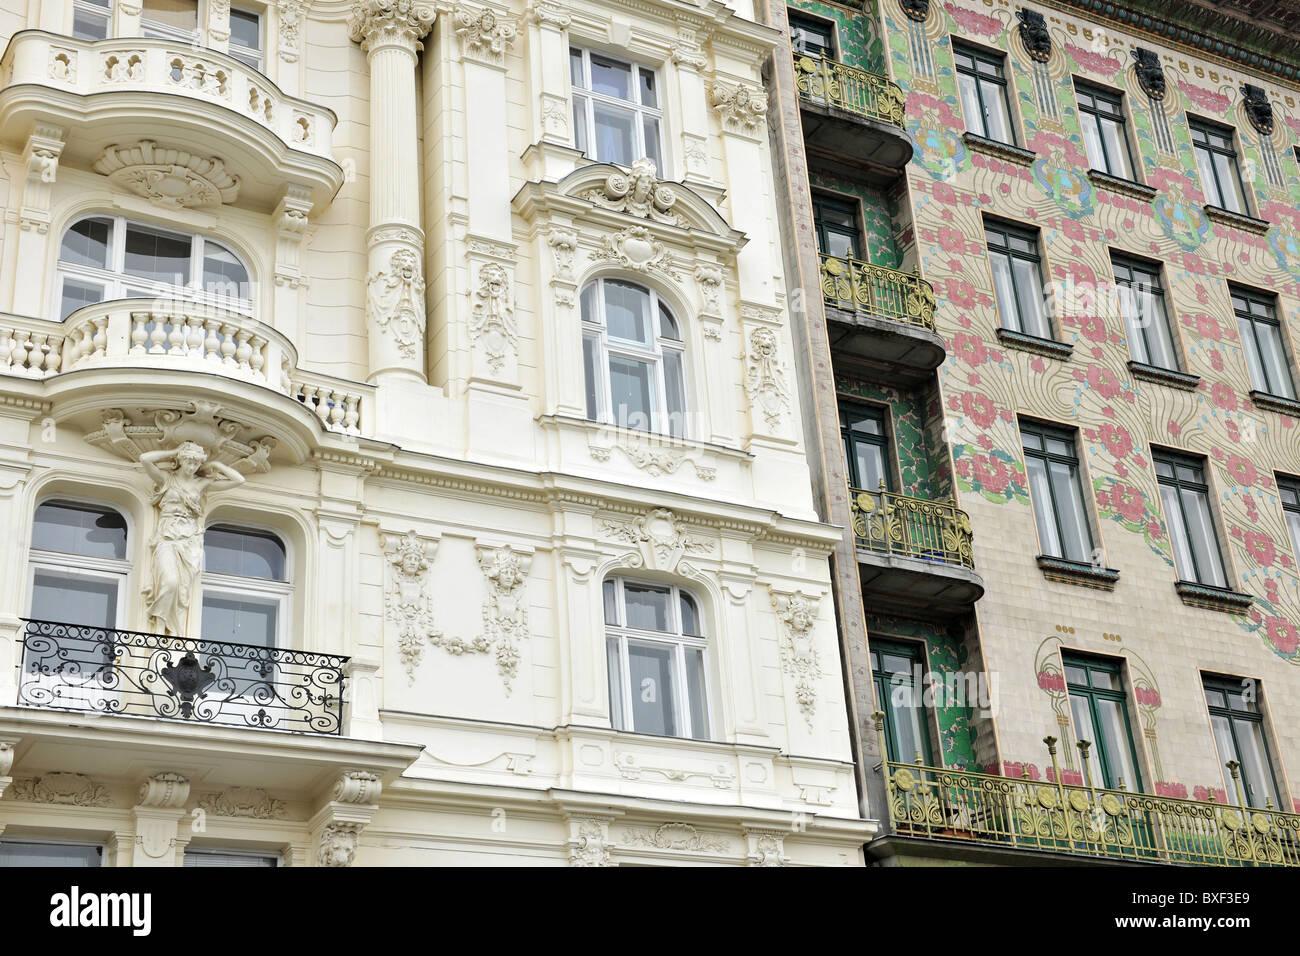 Vienna Austria Majolikahaus Apartment Building Facade 1899 Right